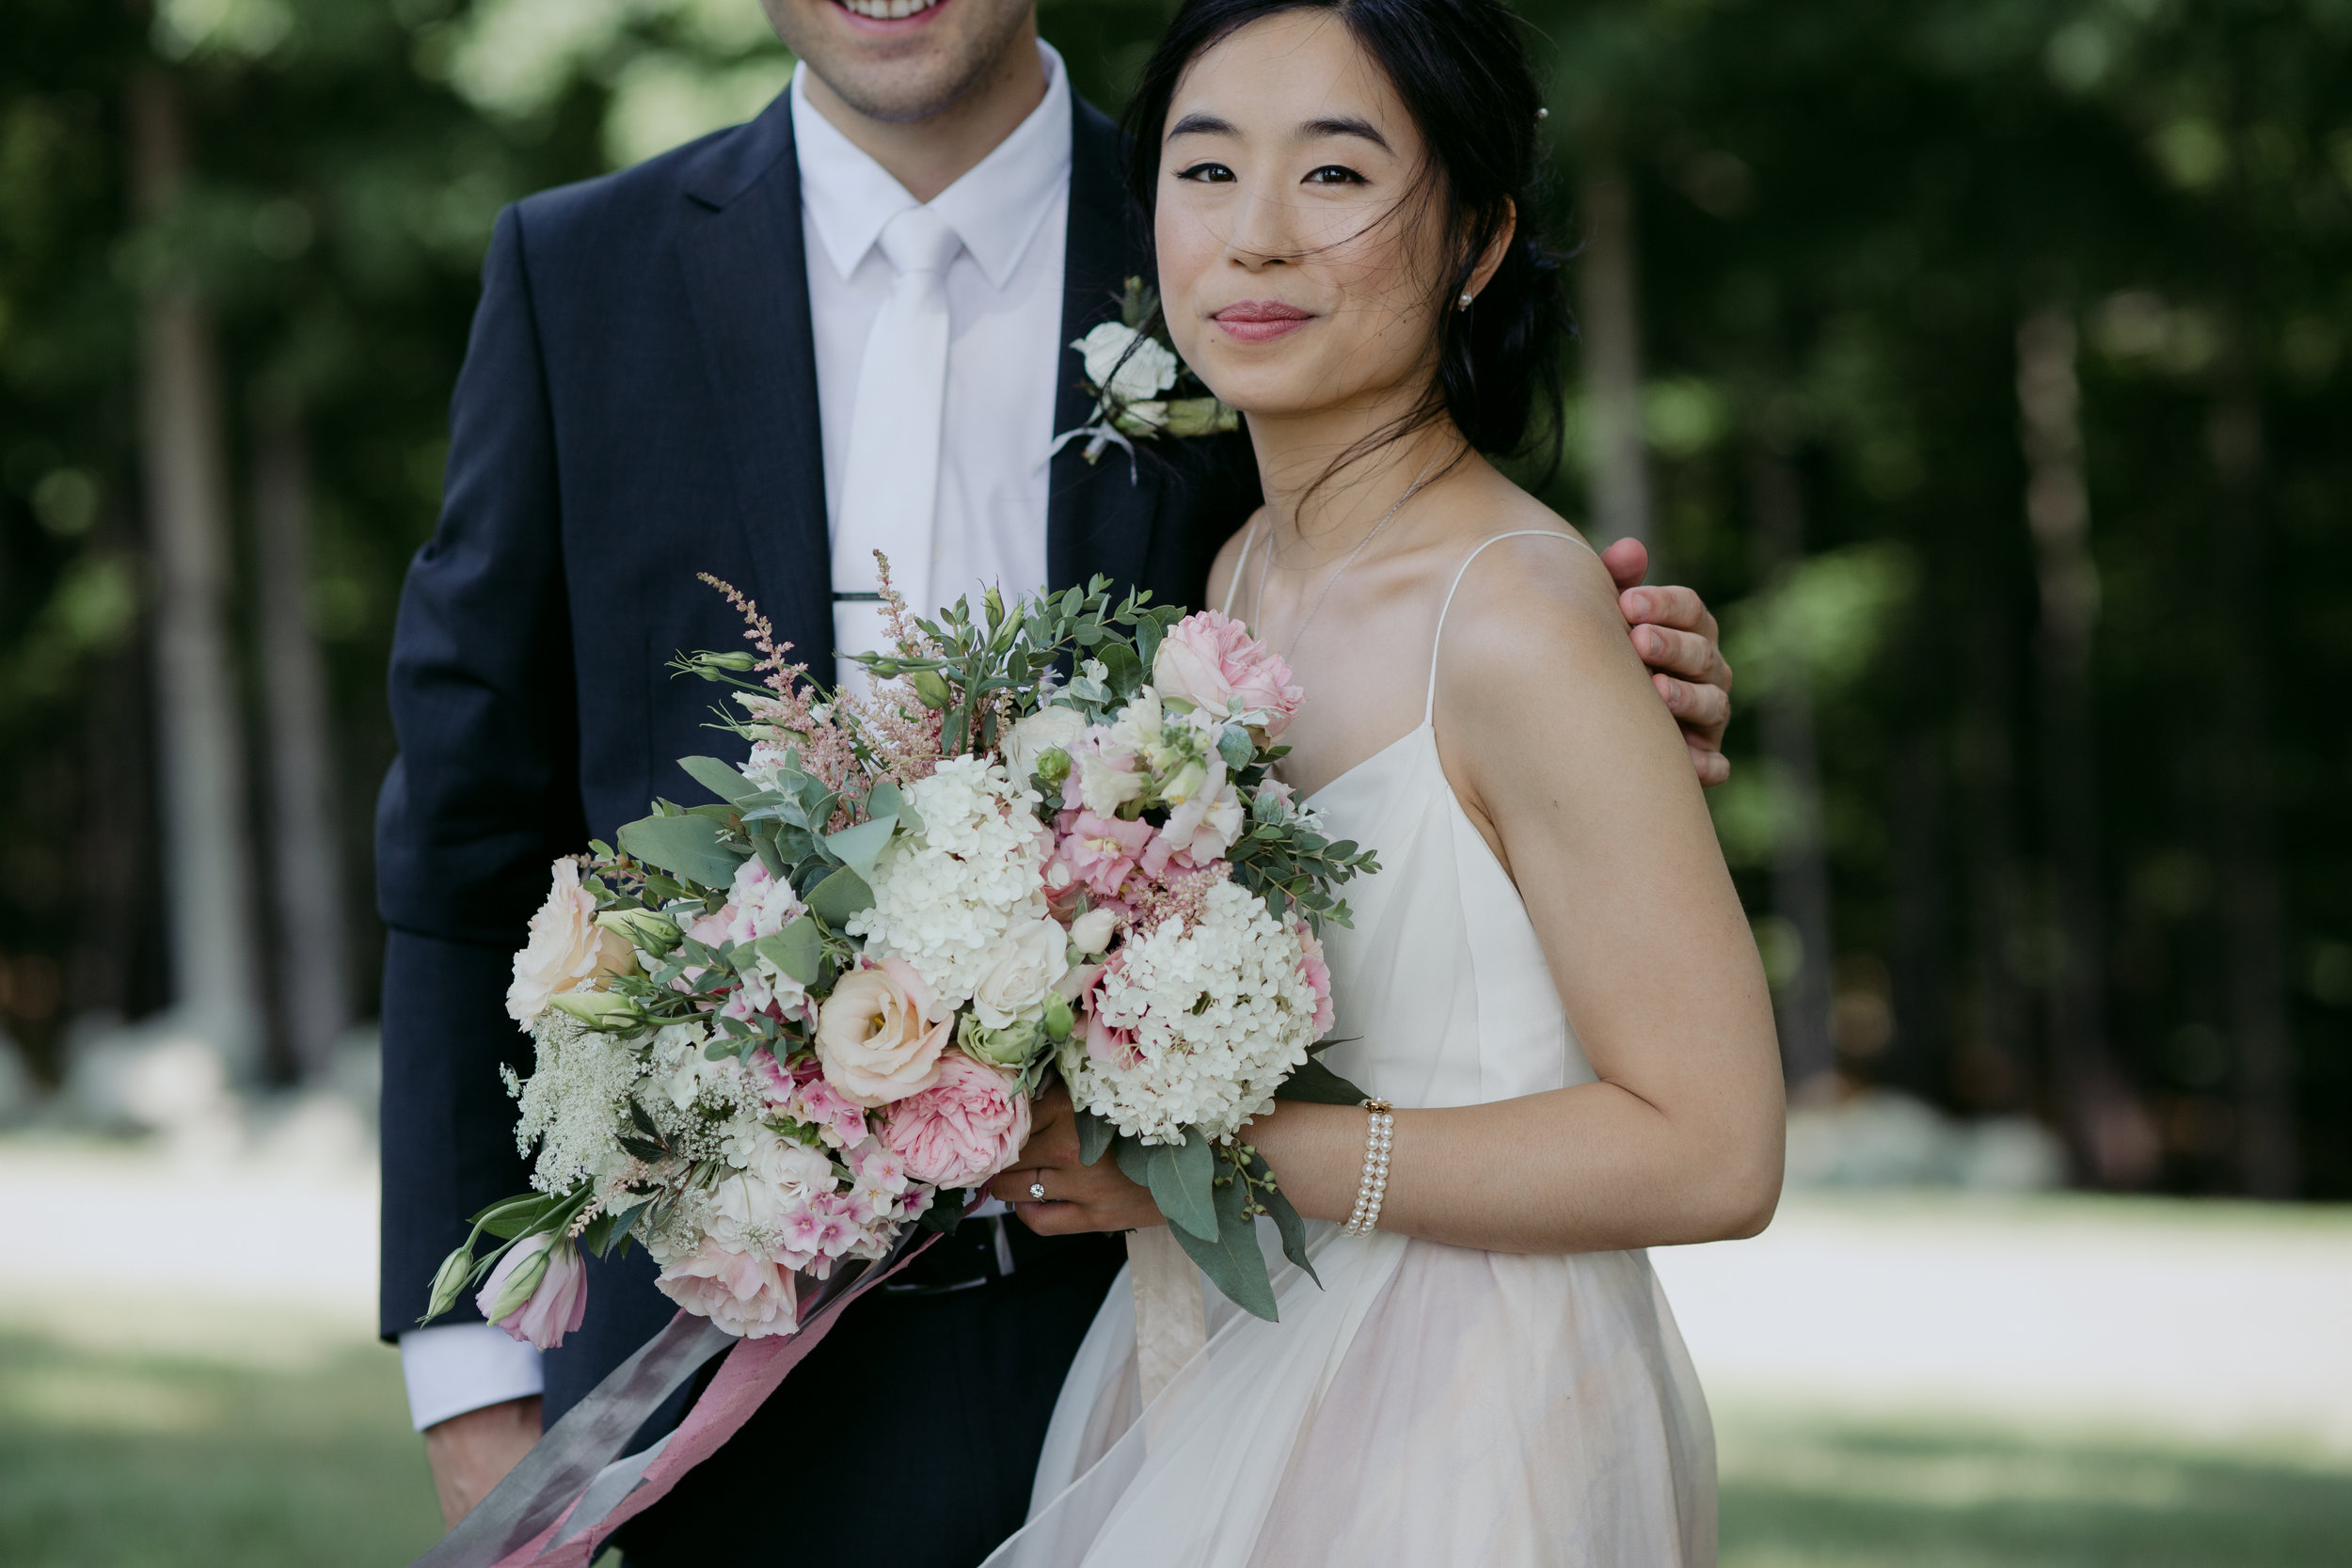 Watershed_Floral_Maine_Farm_Wedding-228.jpg